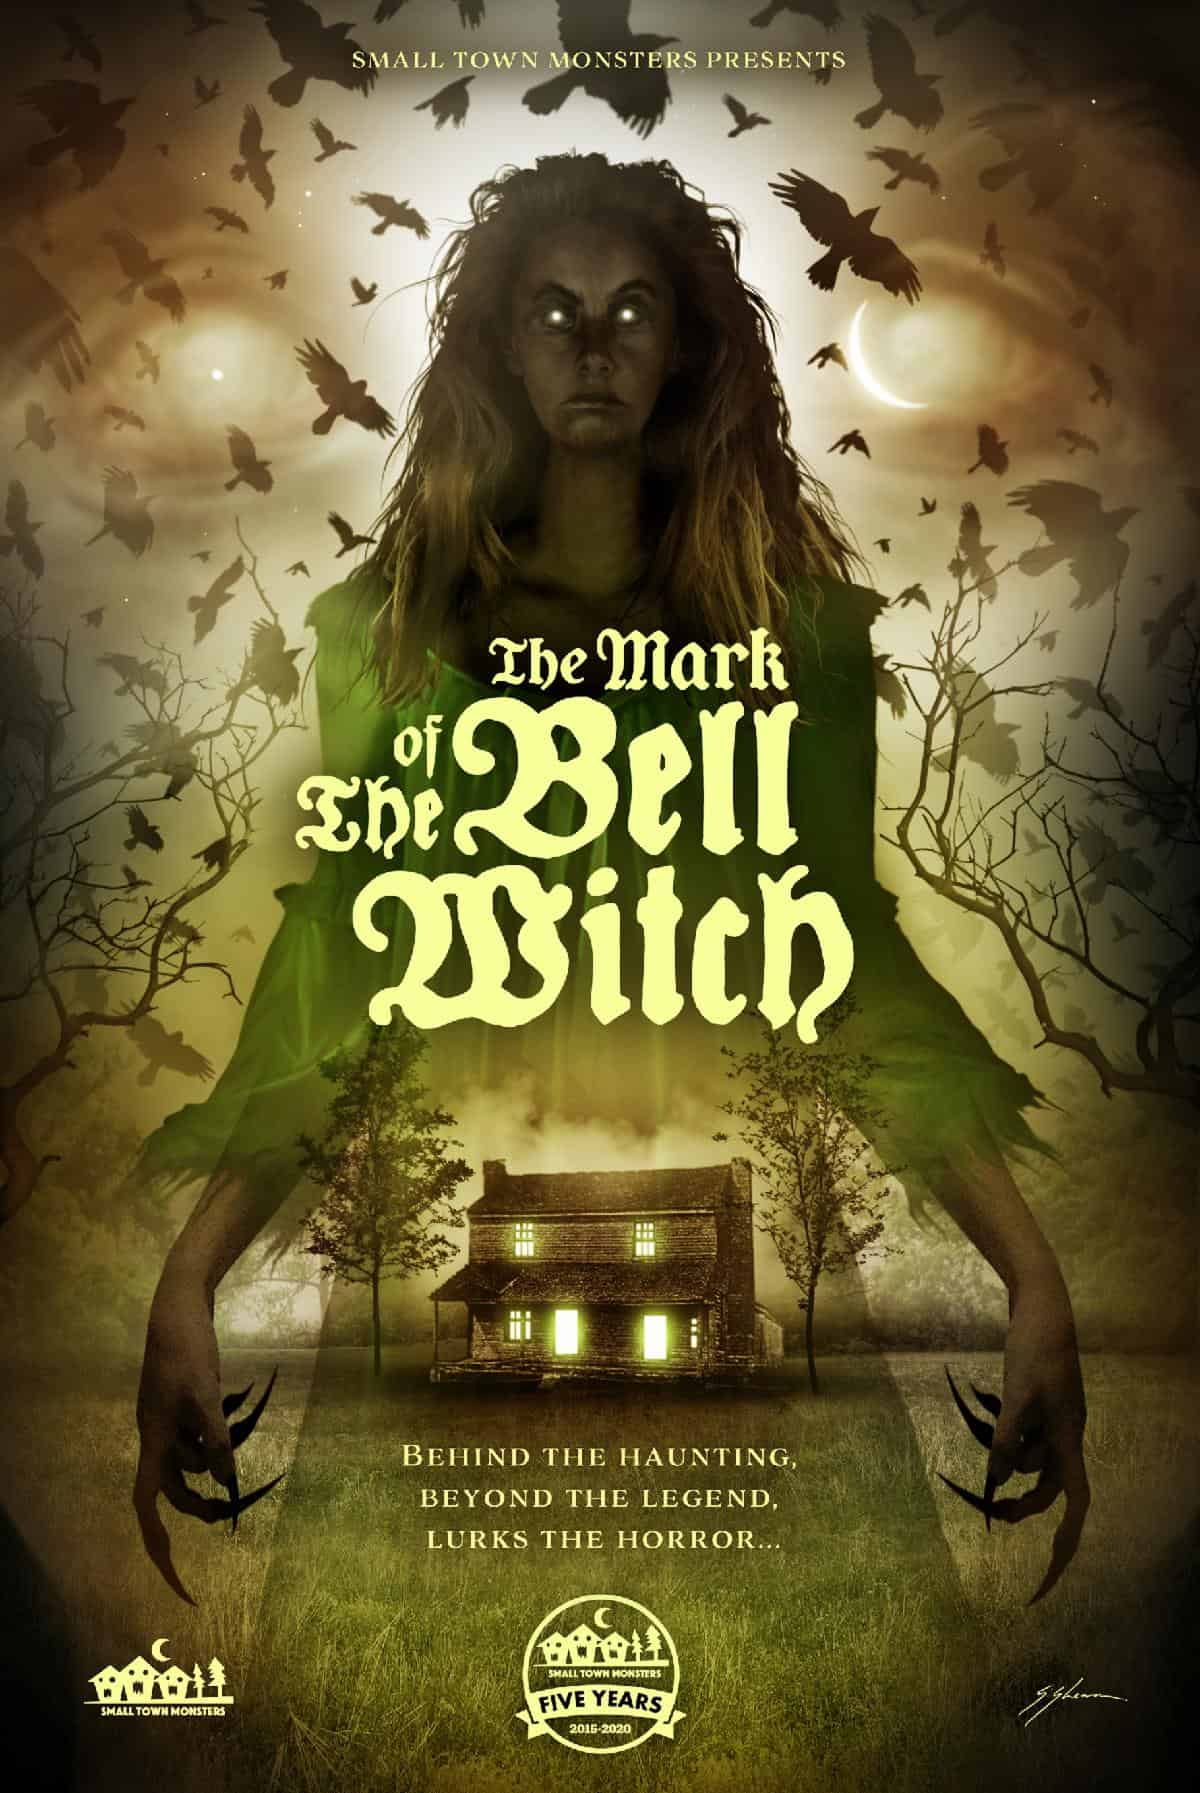 Sunday News: Carol Burnett Show, Loot Crate, Bell Witch, Chopping Mall 8